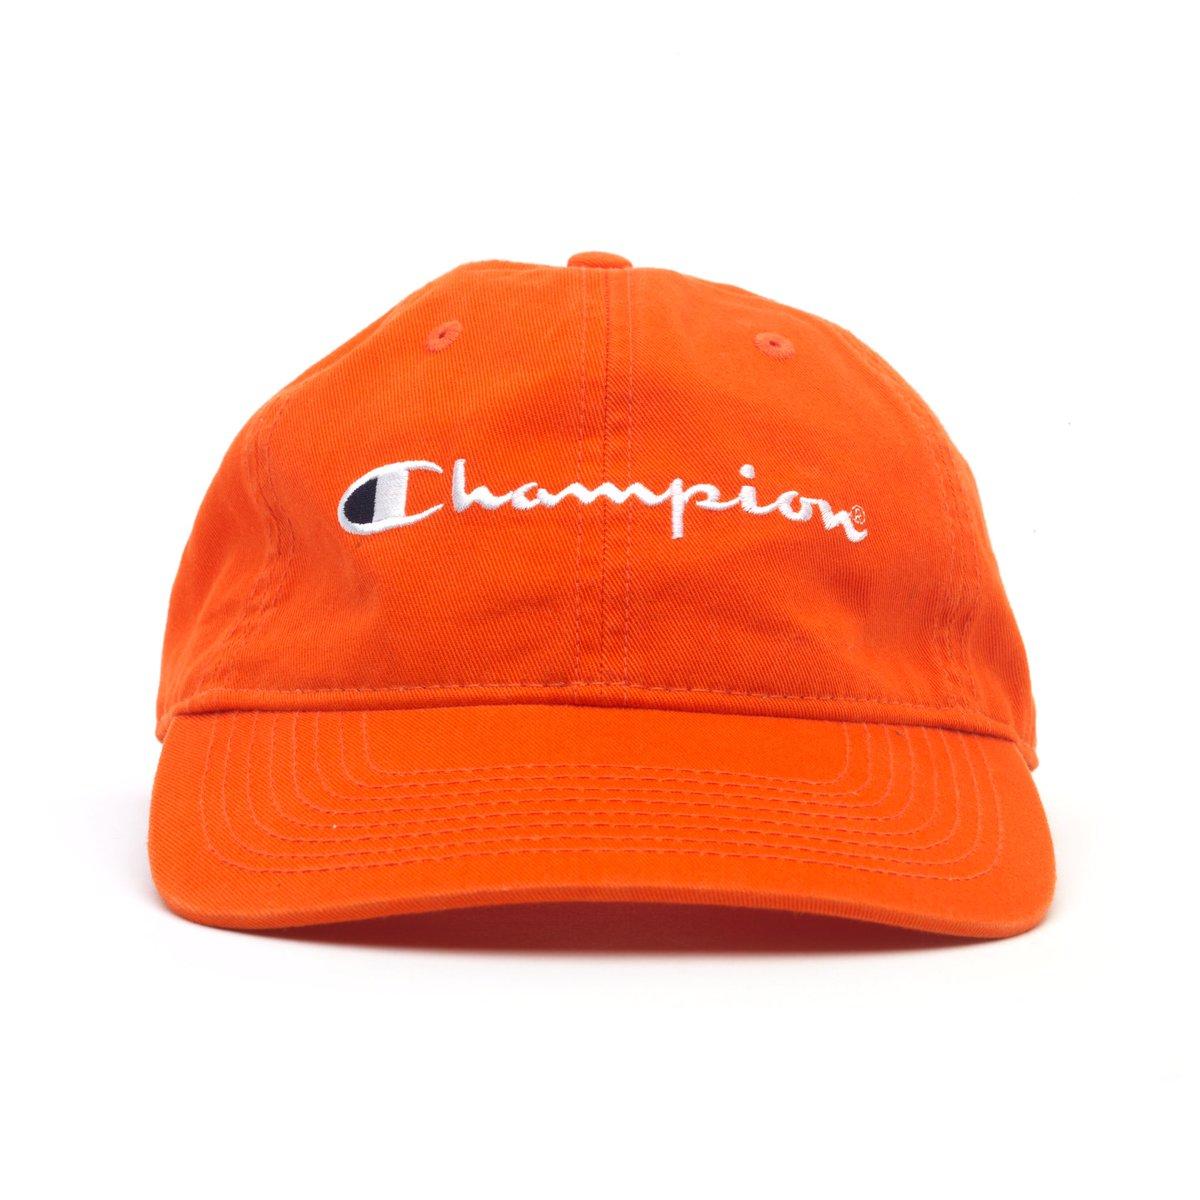 23f6c1c64a3e8 ... store anwar carrots on twitter champion for carrots wordmark ball cap  t.co ubulnug2xcu2026 dba0d